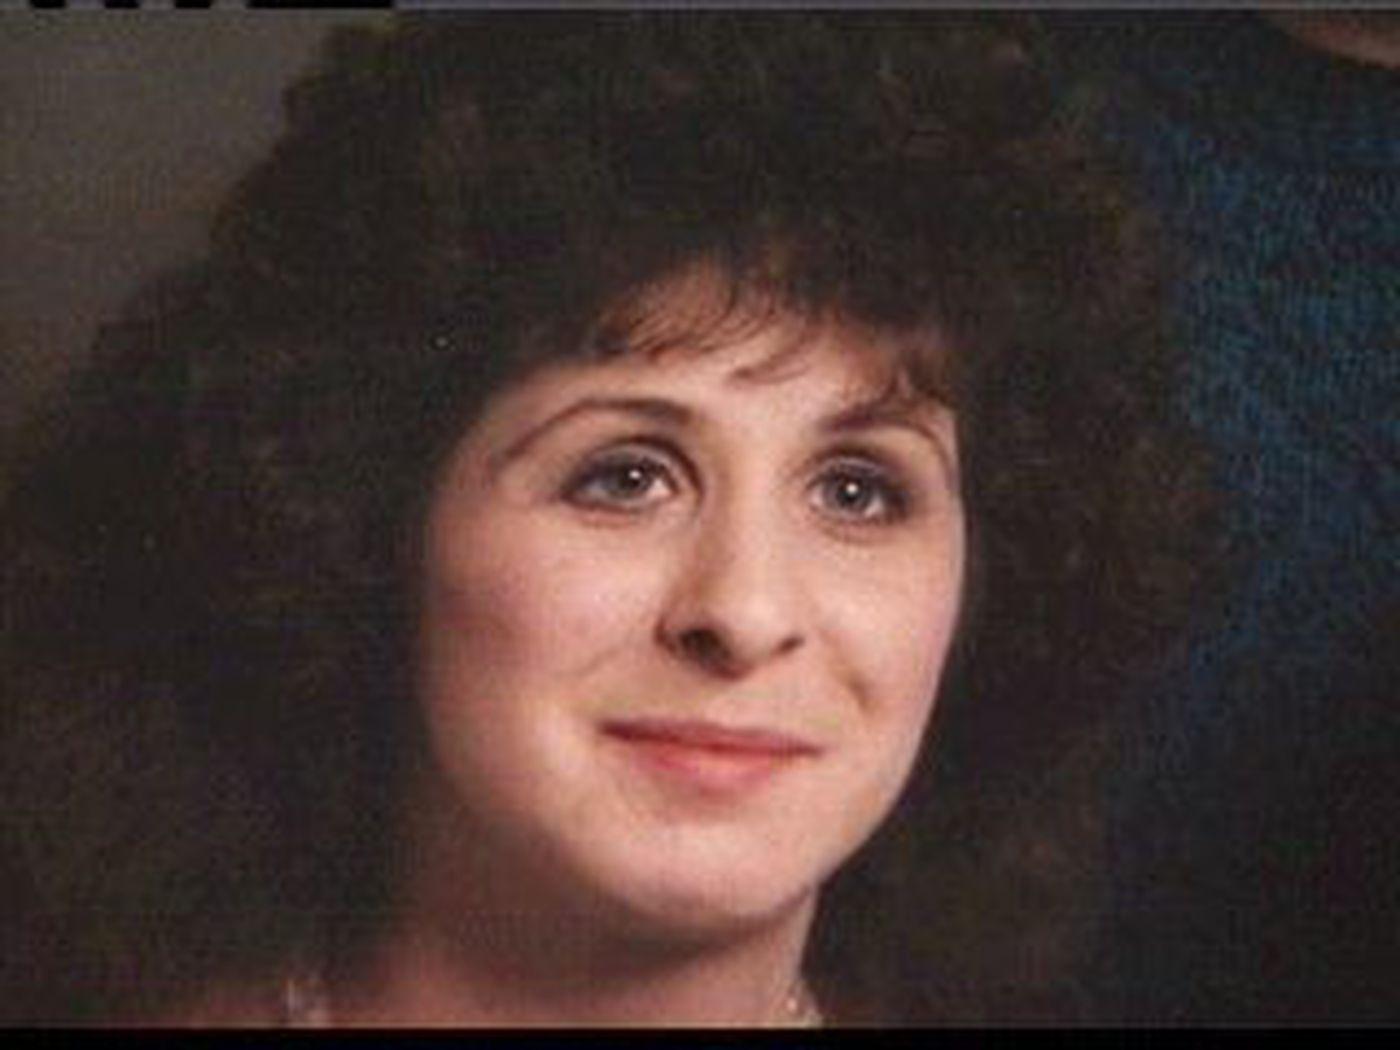 3rd victim; Mary Jo Newton